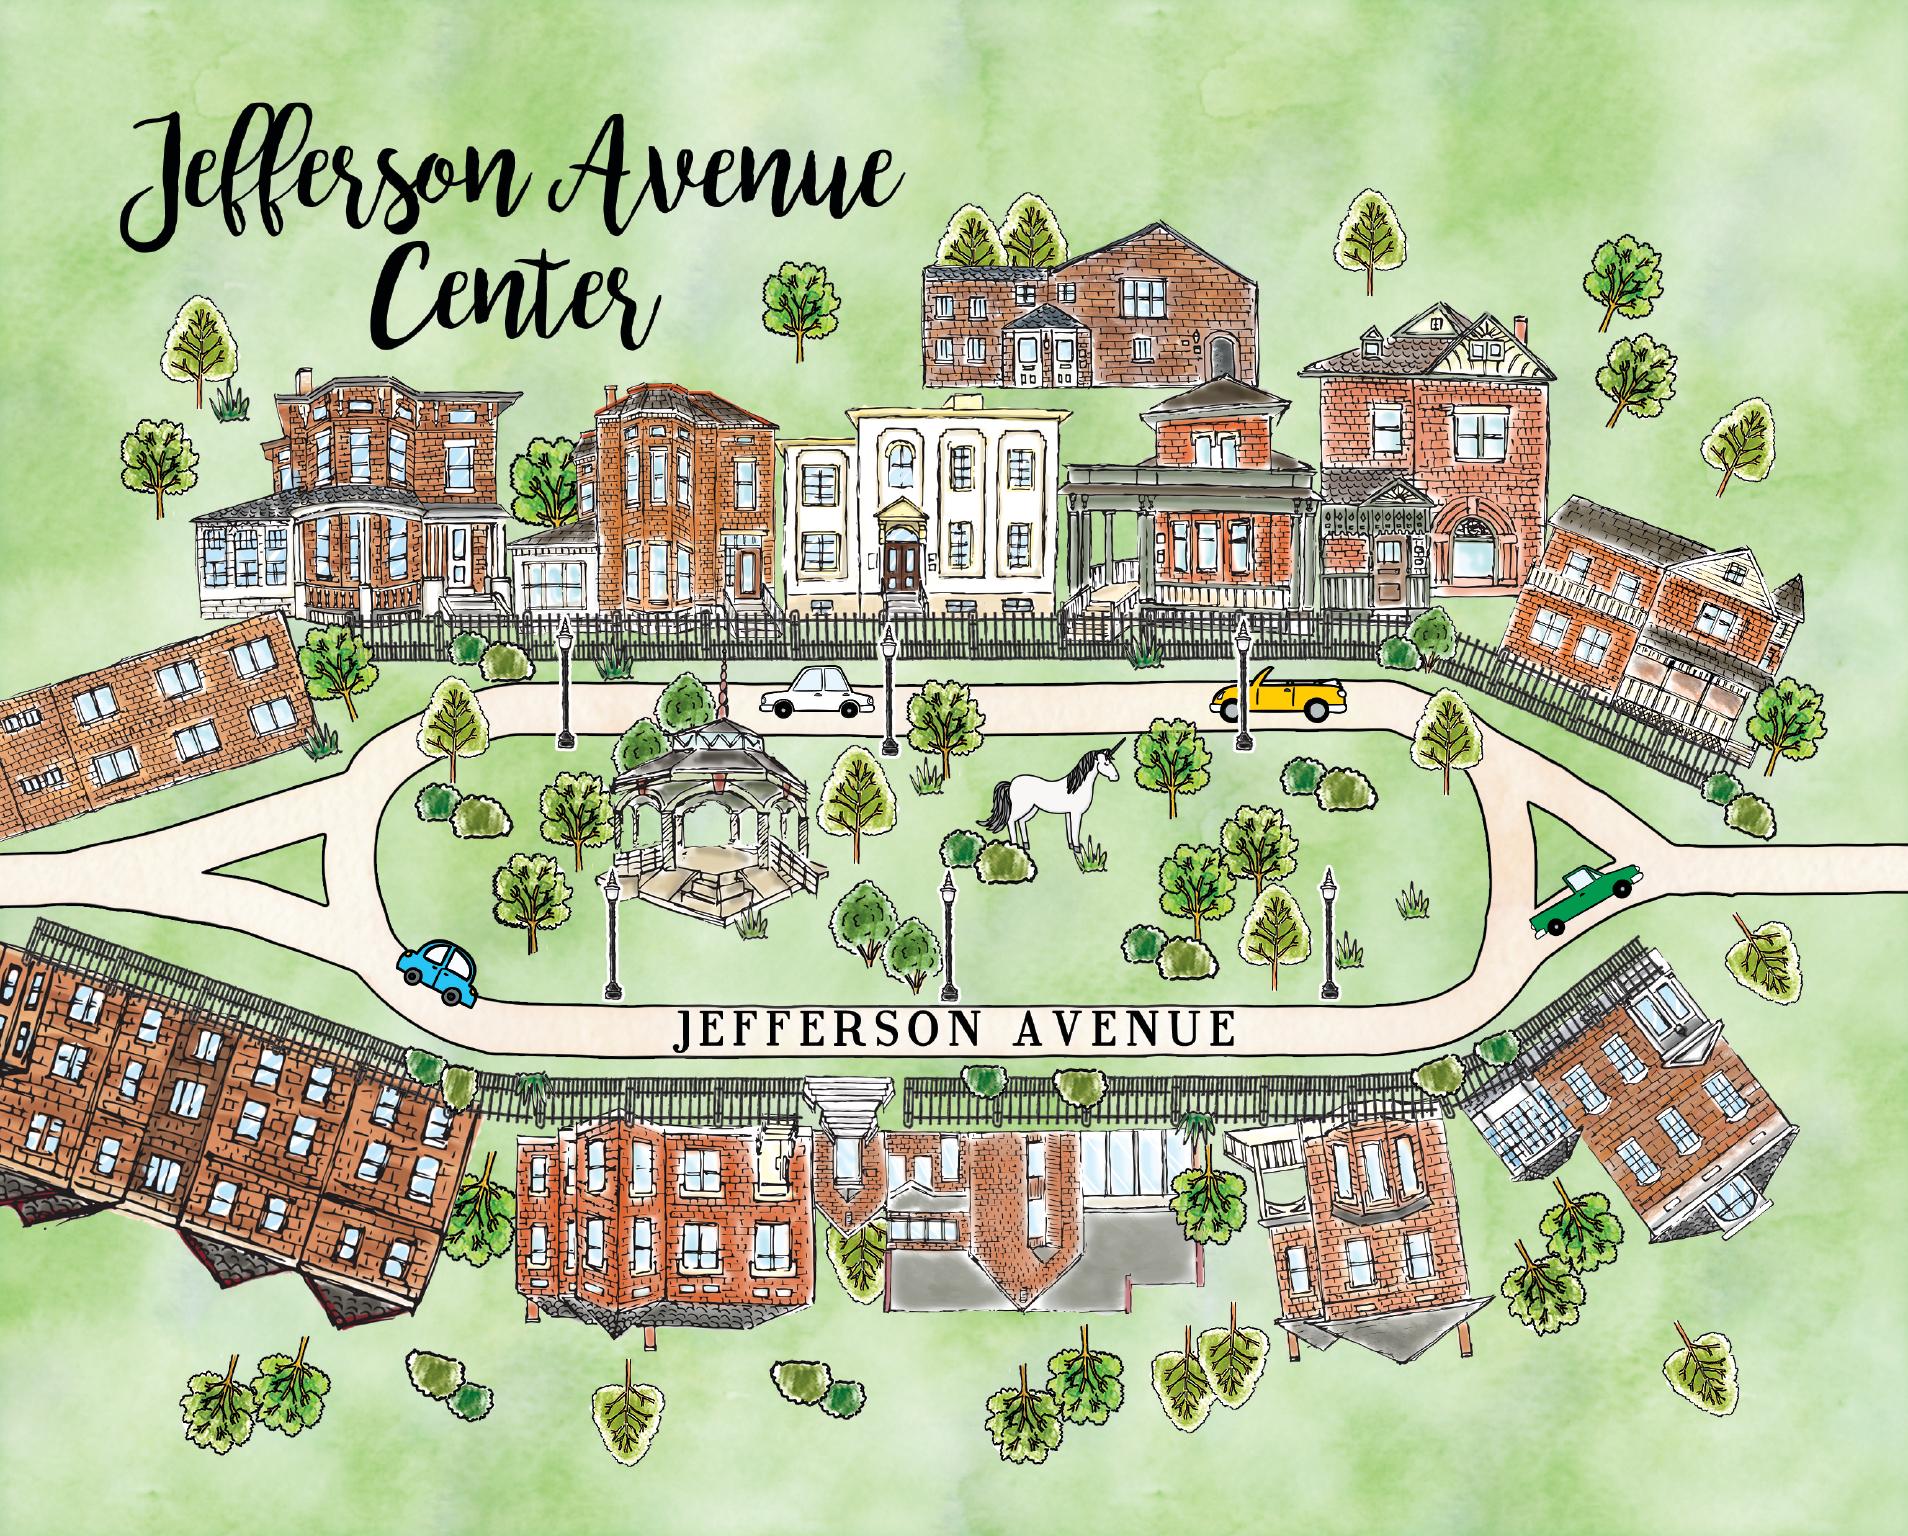 JEFFERSON Avenue Center Illustrated map.jpeg